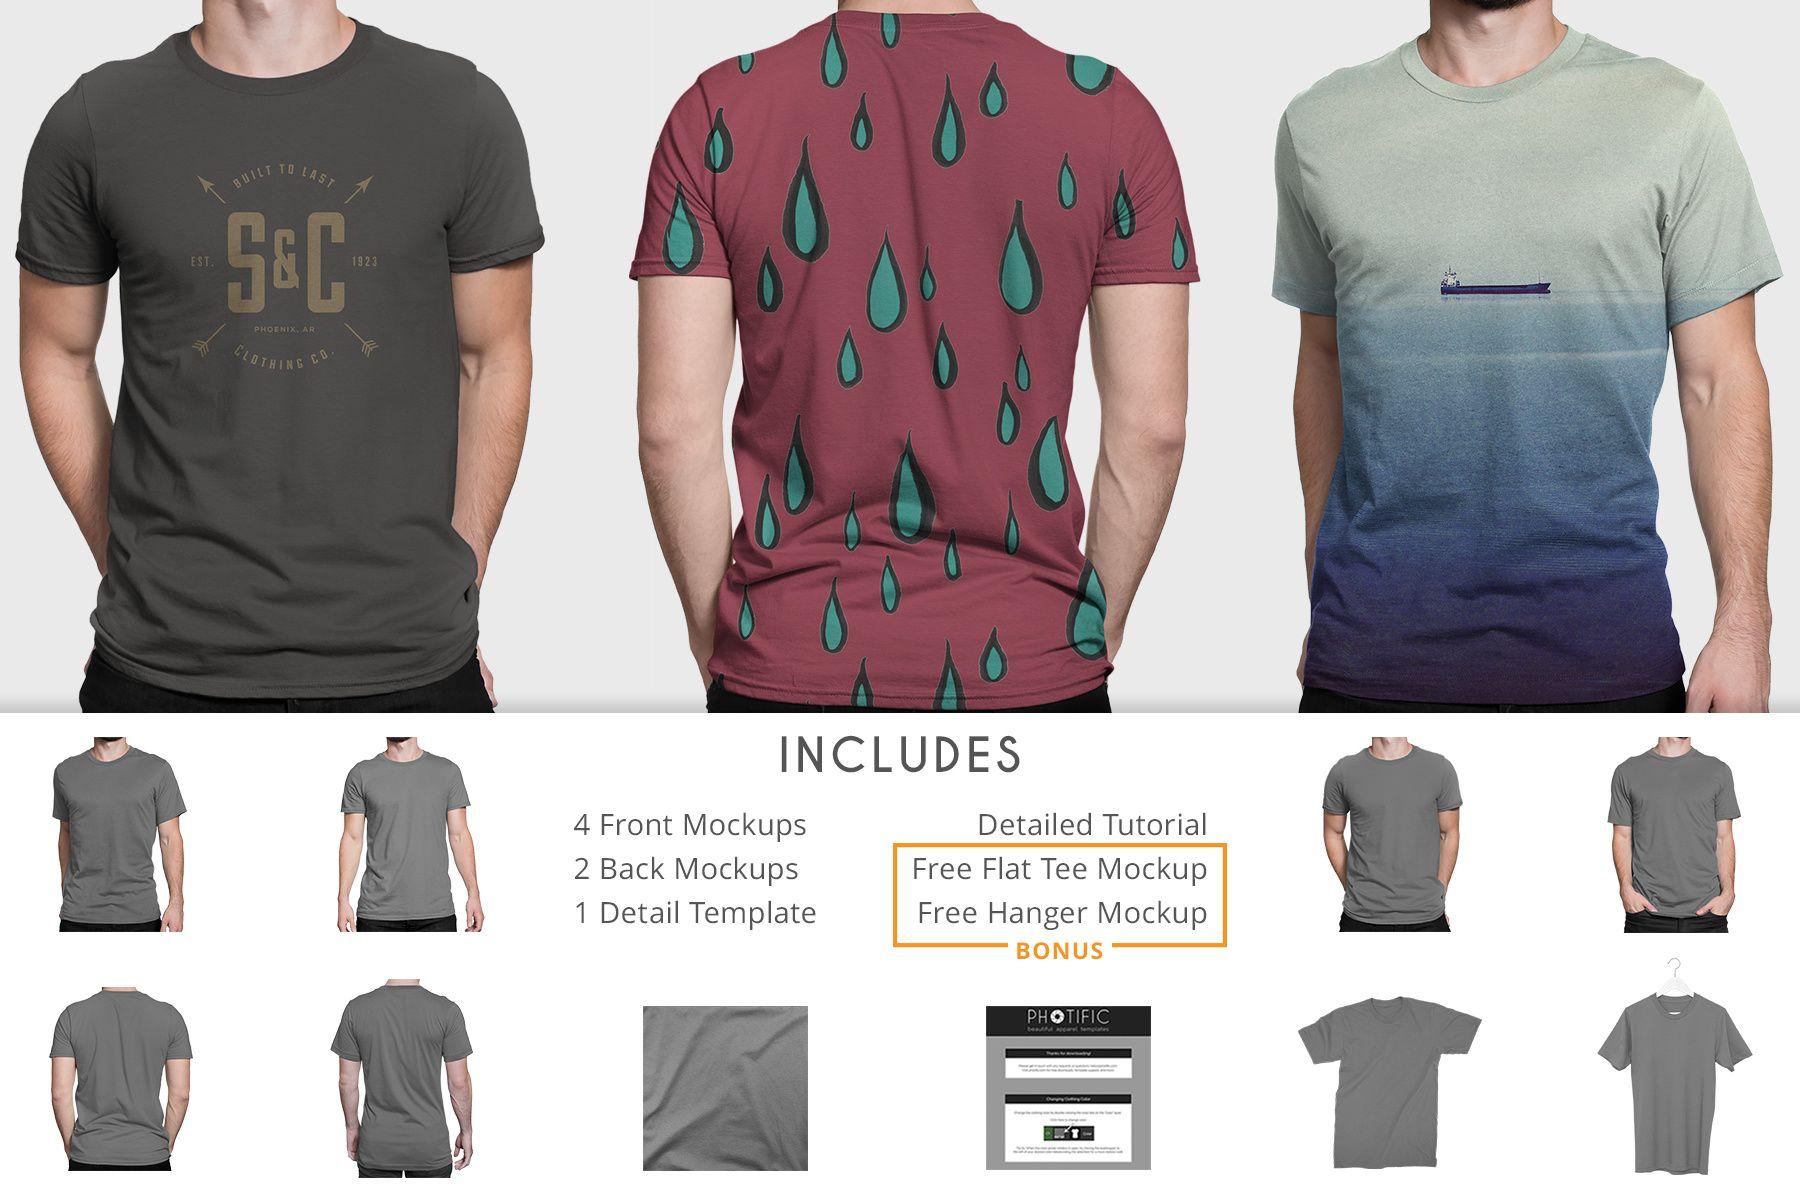 Download T Shirt Apparel Mockups Clothing Mockup T Shirt Design Template Shirt Mockup